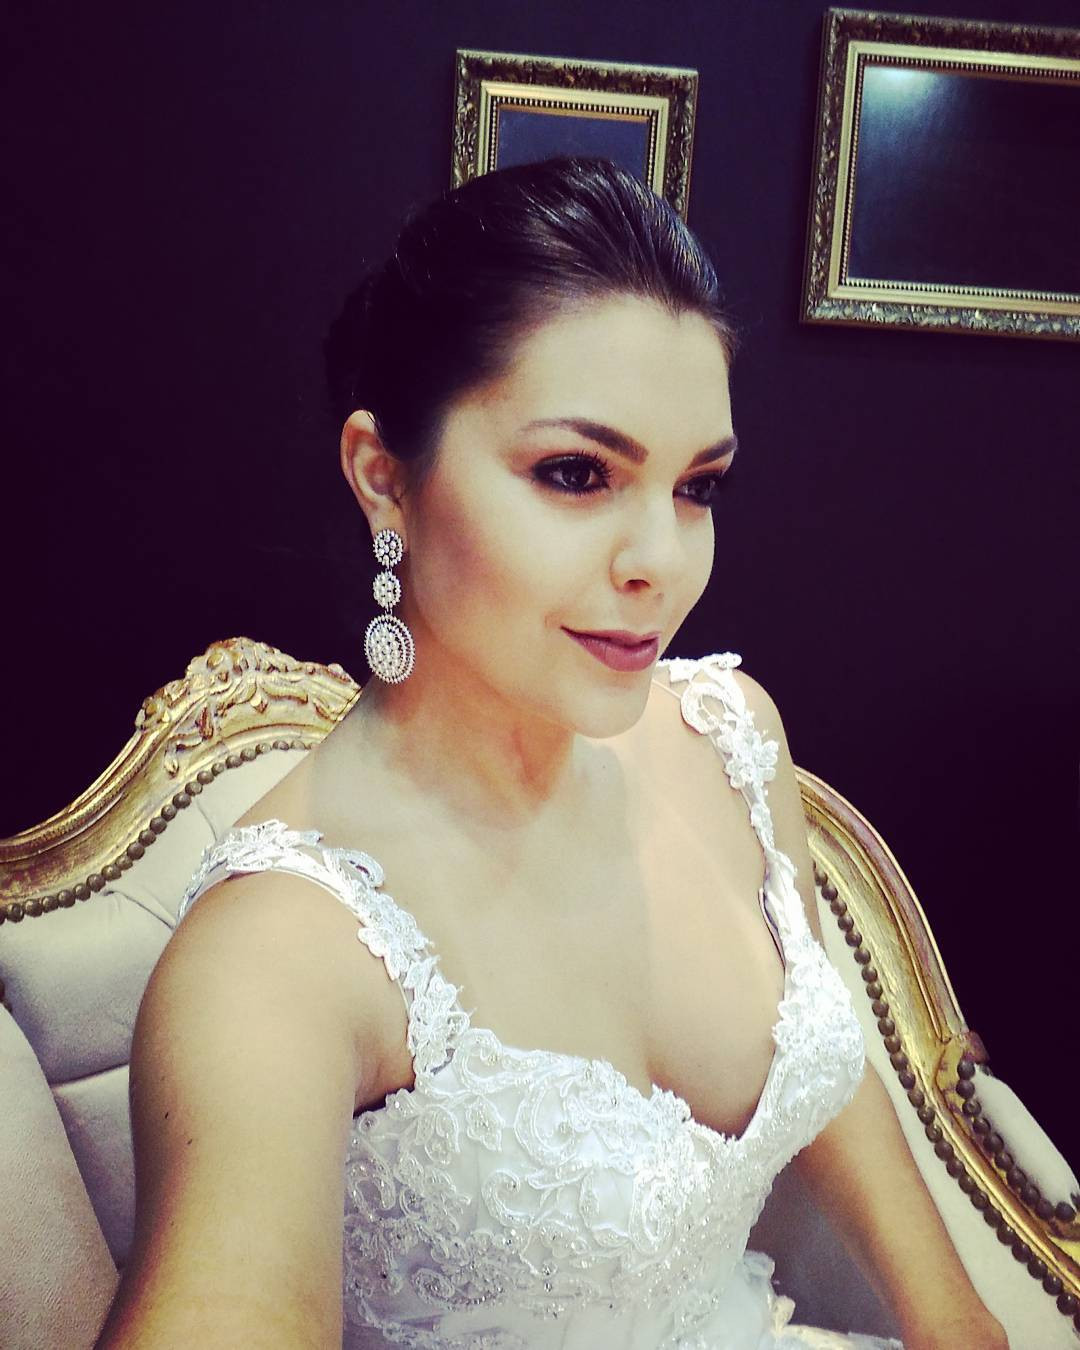 jessica poeta lirio, miss friendship brazil 2021/top 10 de miss tourism queen international 2015. - Página 5 Bz7qfi10